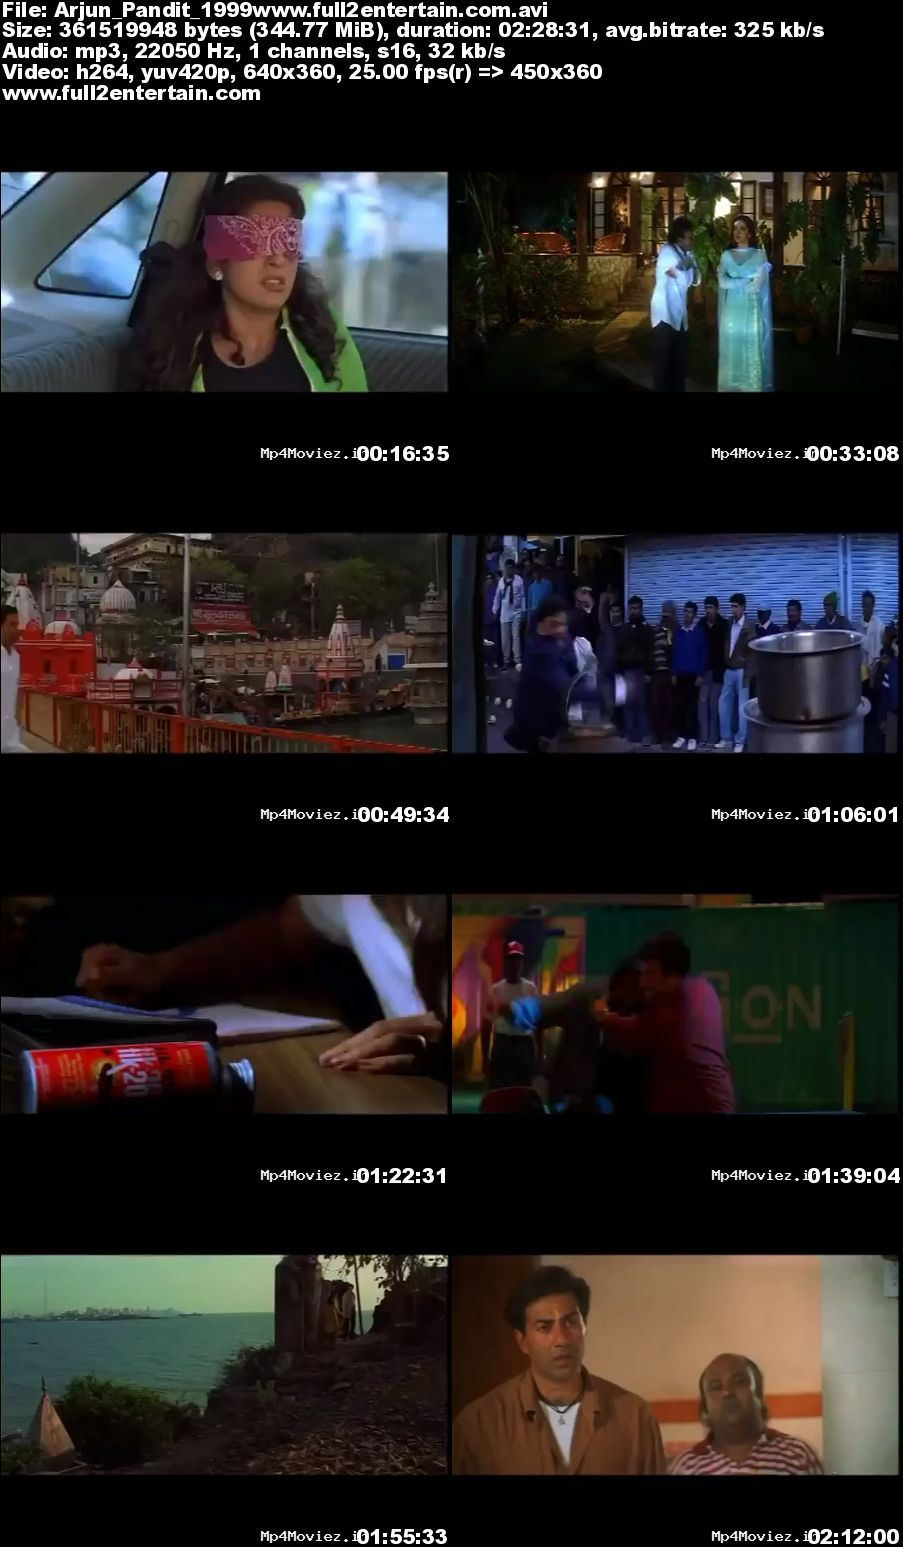 Arjun Pandit 1999 Full Movie Download Free in Dvdrip 480p